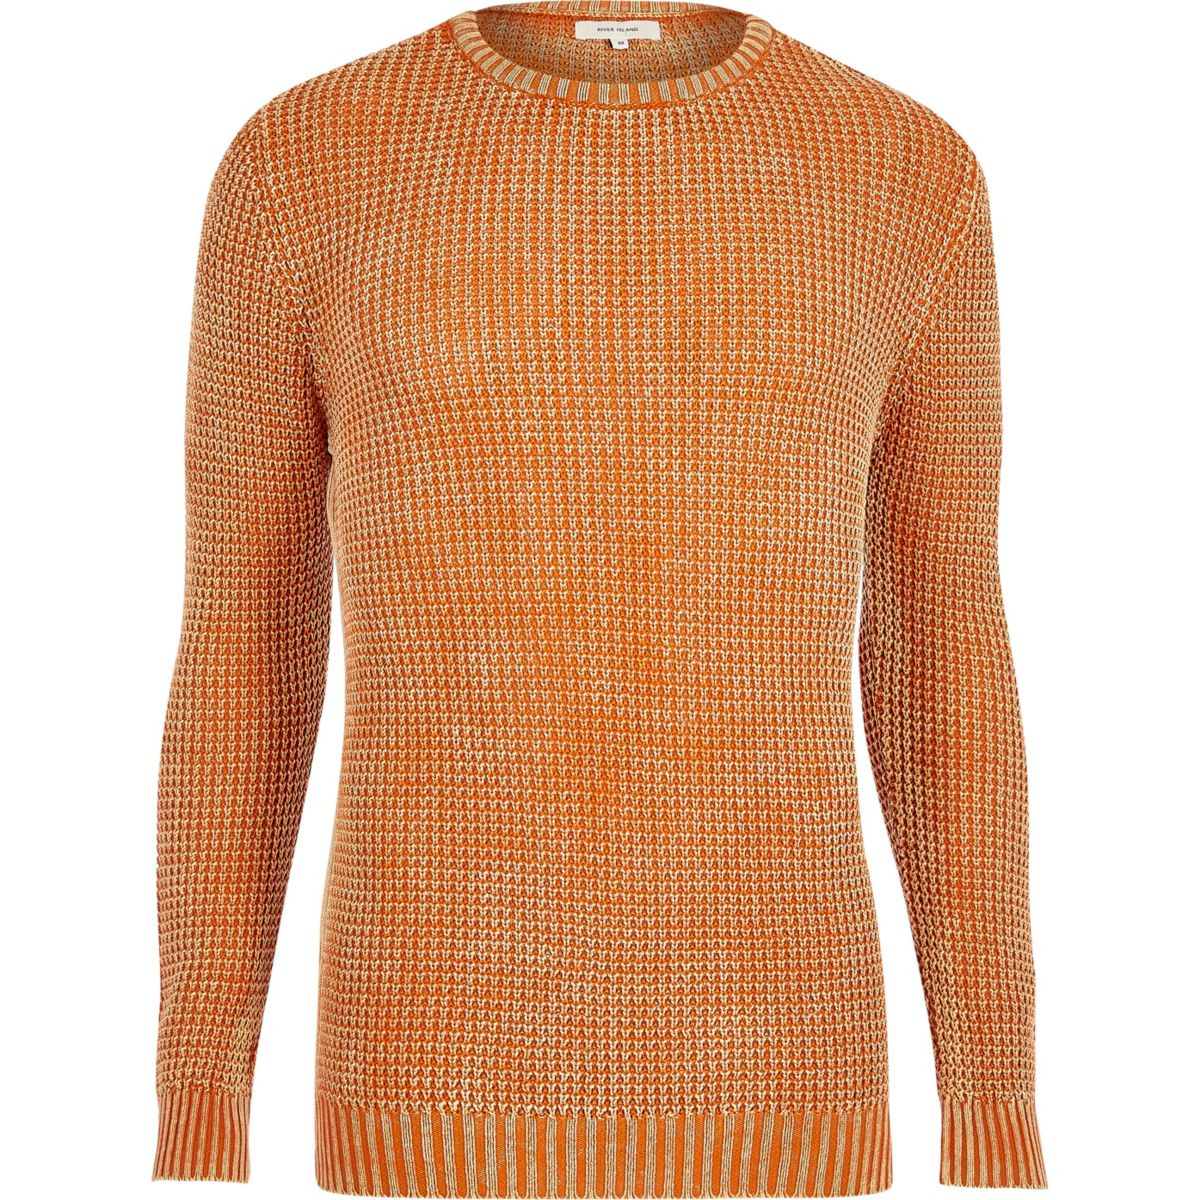 Orange acid wash slim fit knit sweater